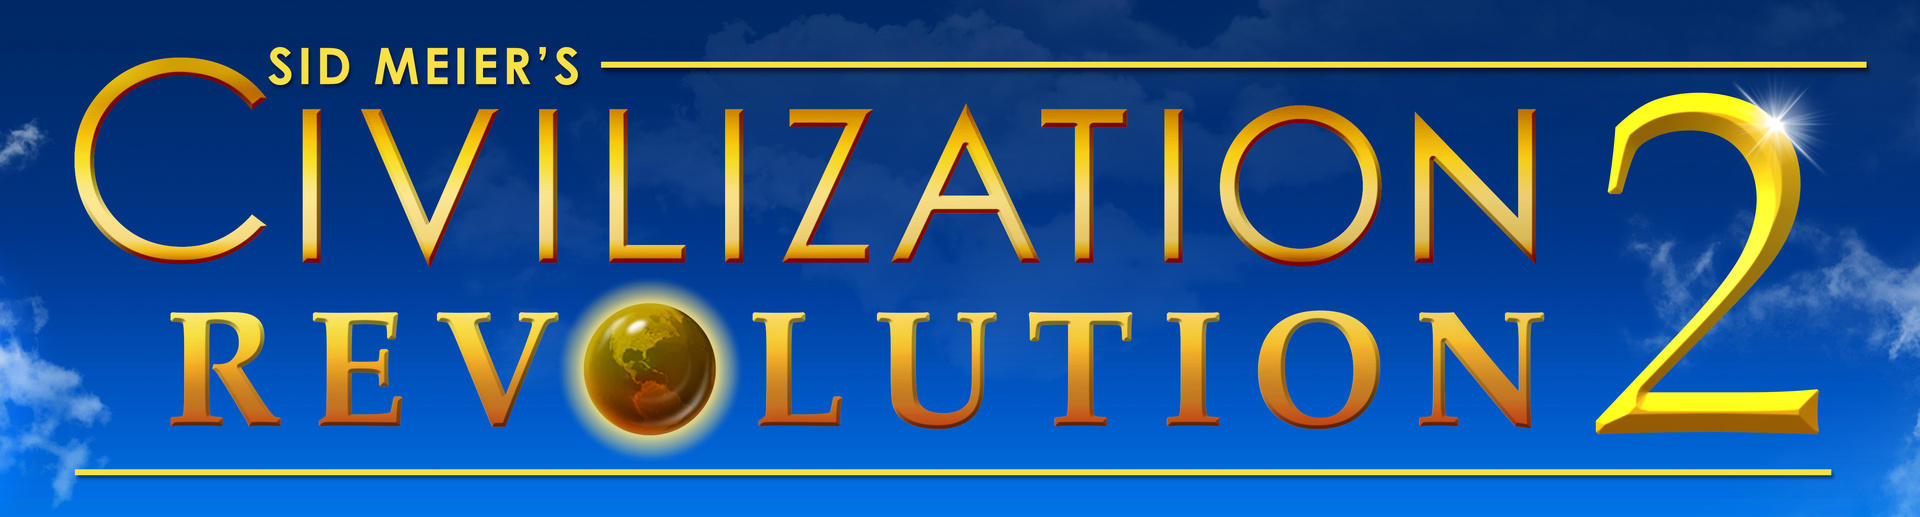 iOS: Sid Meier's Civilization Revolution 2